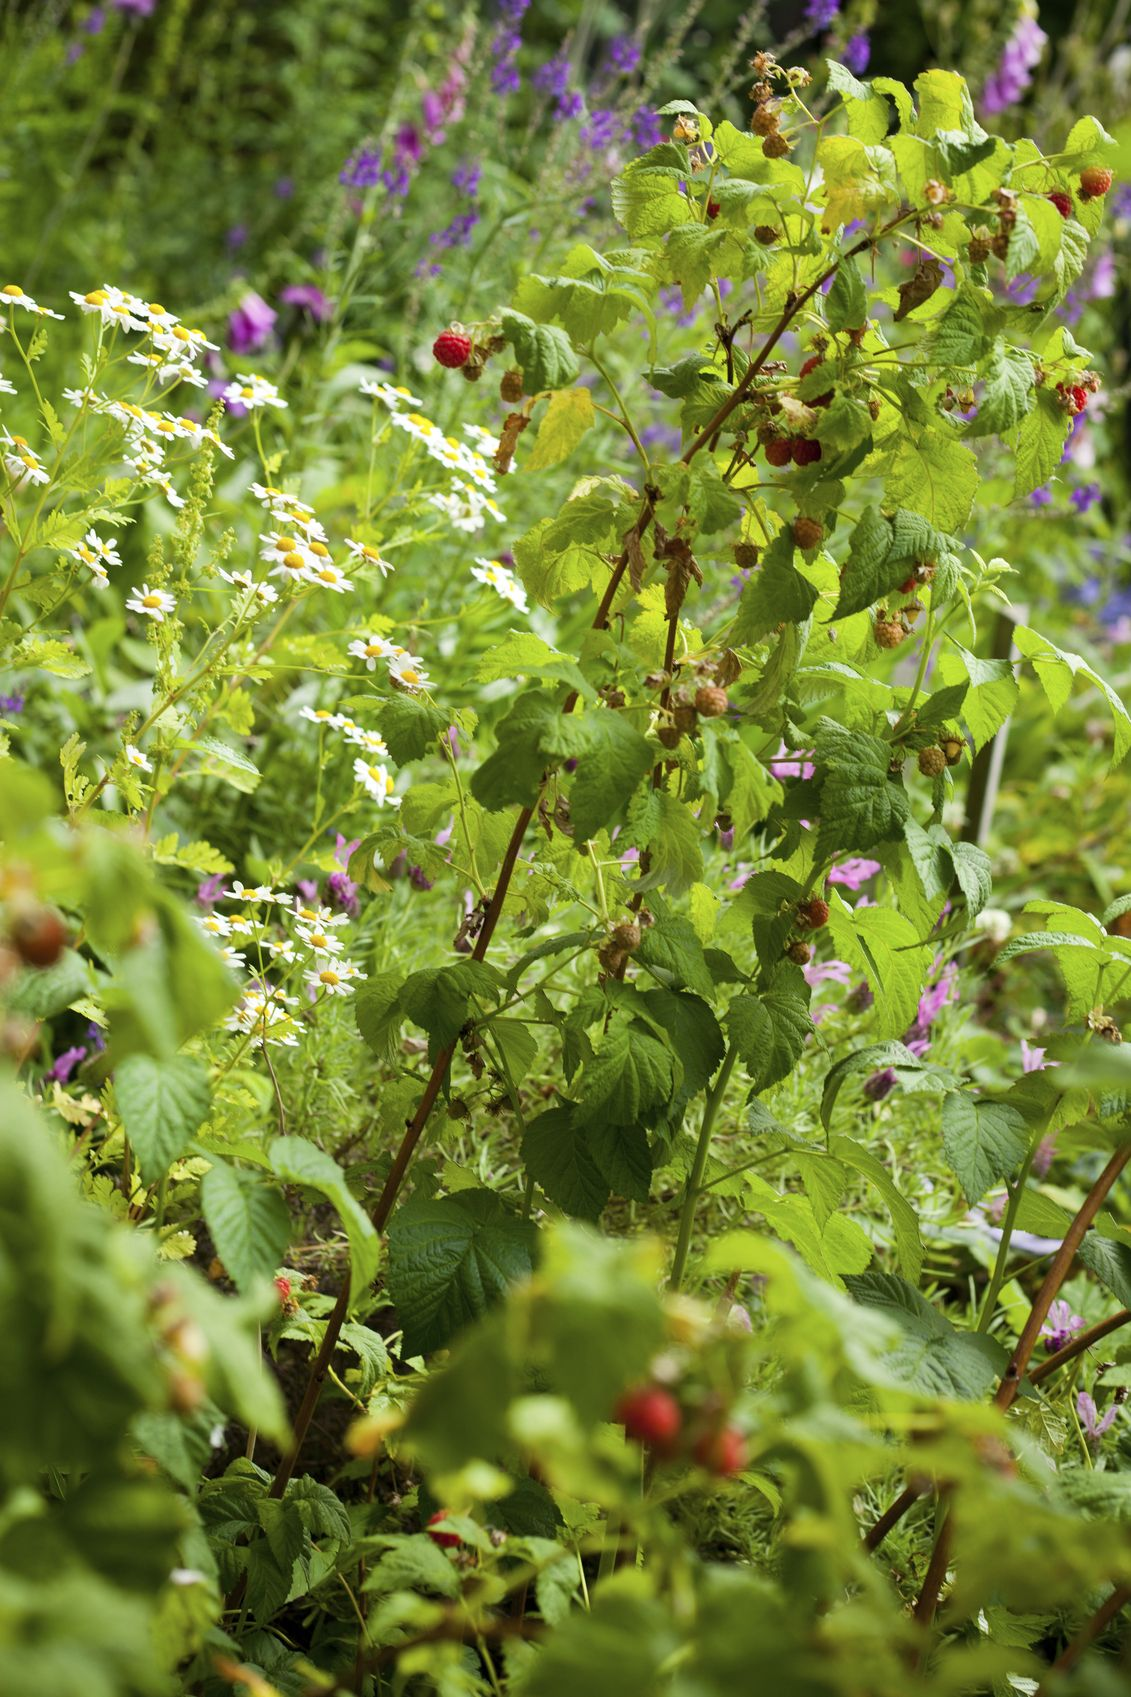 Raspberry Companion Plants What To Plant With Raspberries